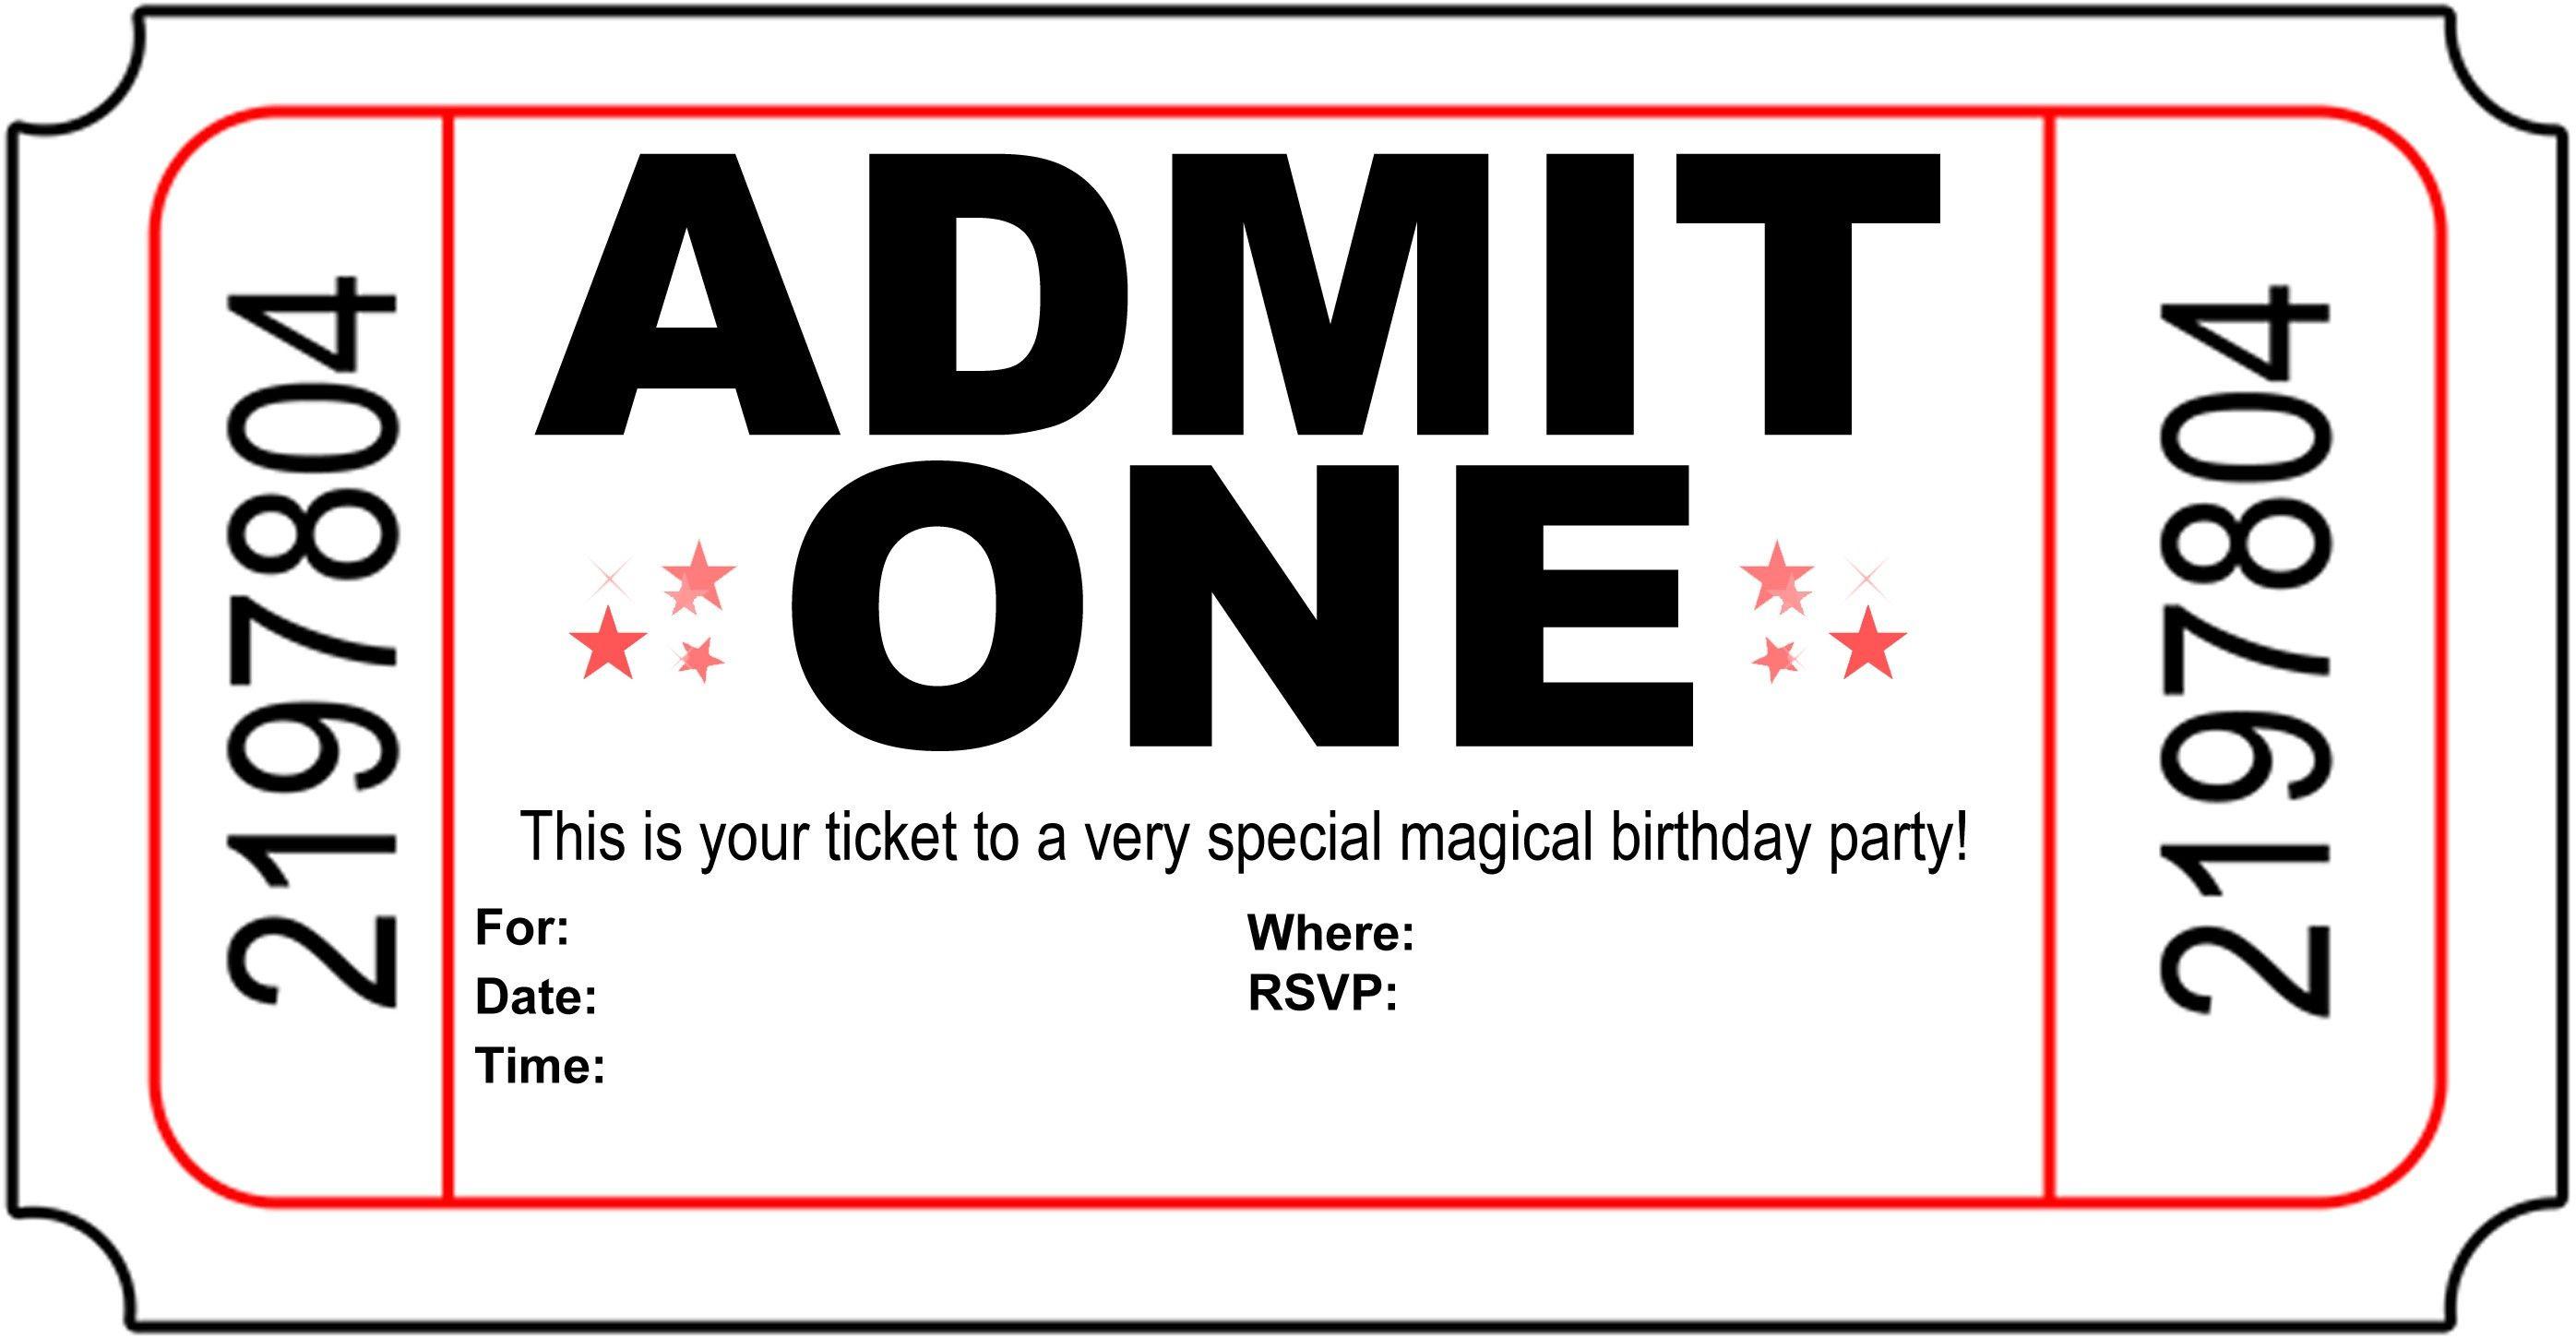 Birthday Party Invitation Free Printable | Printshop. | Pinterest - Free Printable Movie Ticket Birthday Party Invitations